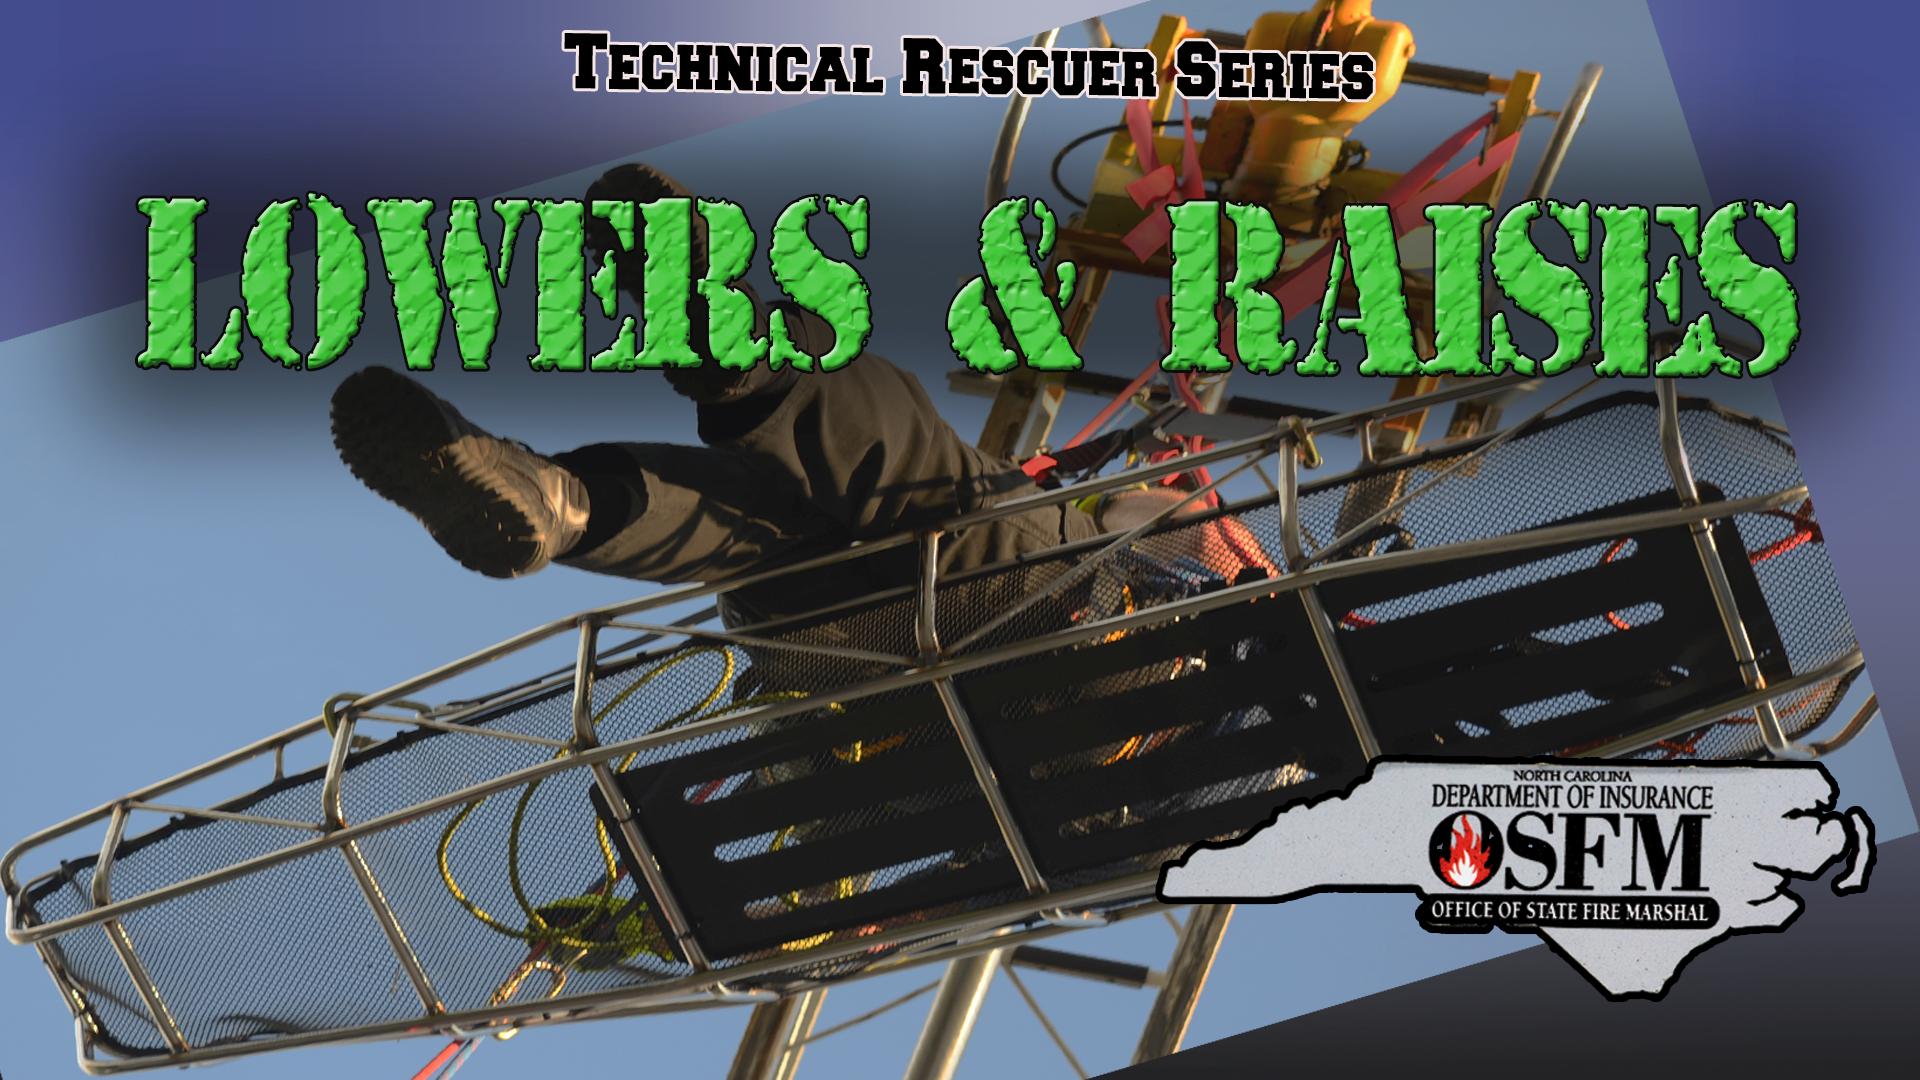 TR Lowers & Raises